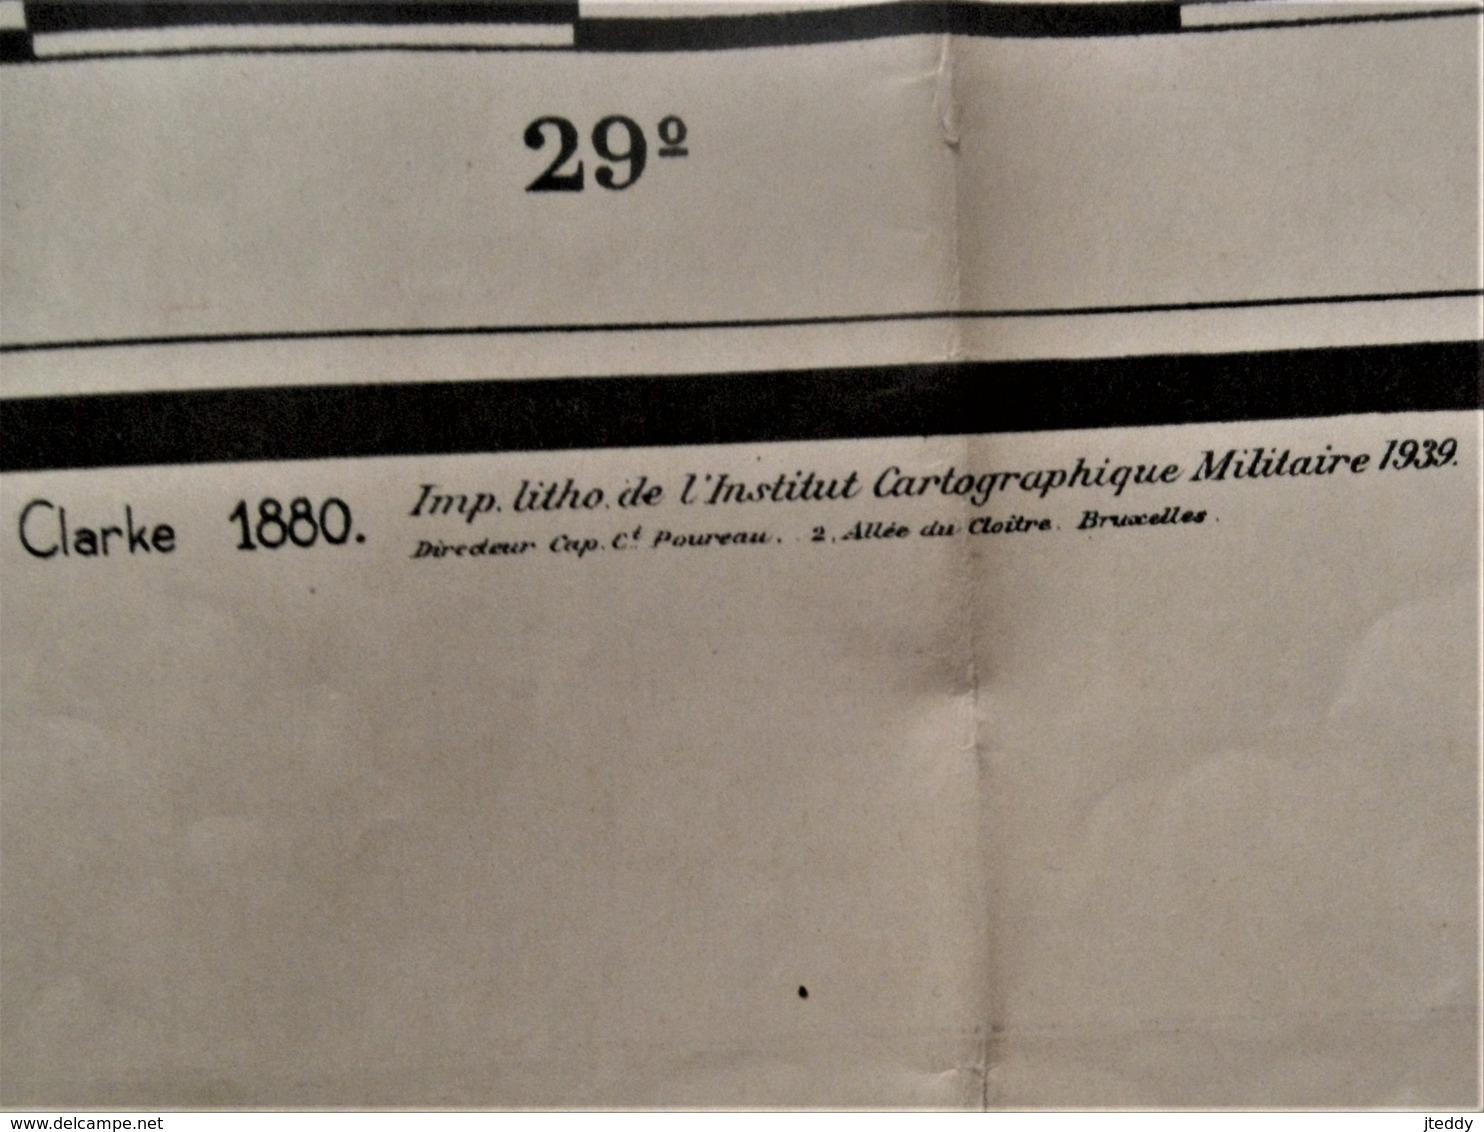 Kaart   TERRITOIRES  DU  RUANDA  -- URUNDI  1938--39 - Cartes Géographiques